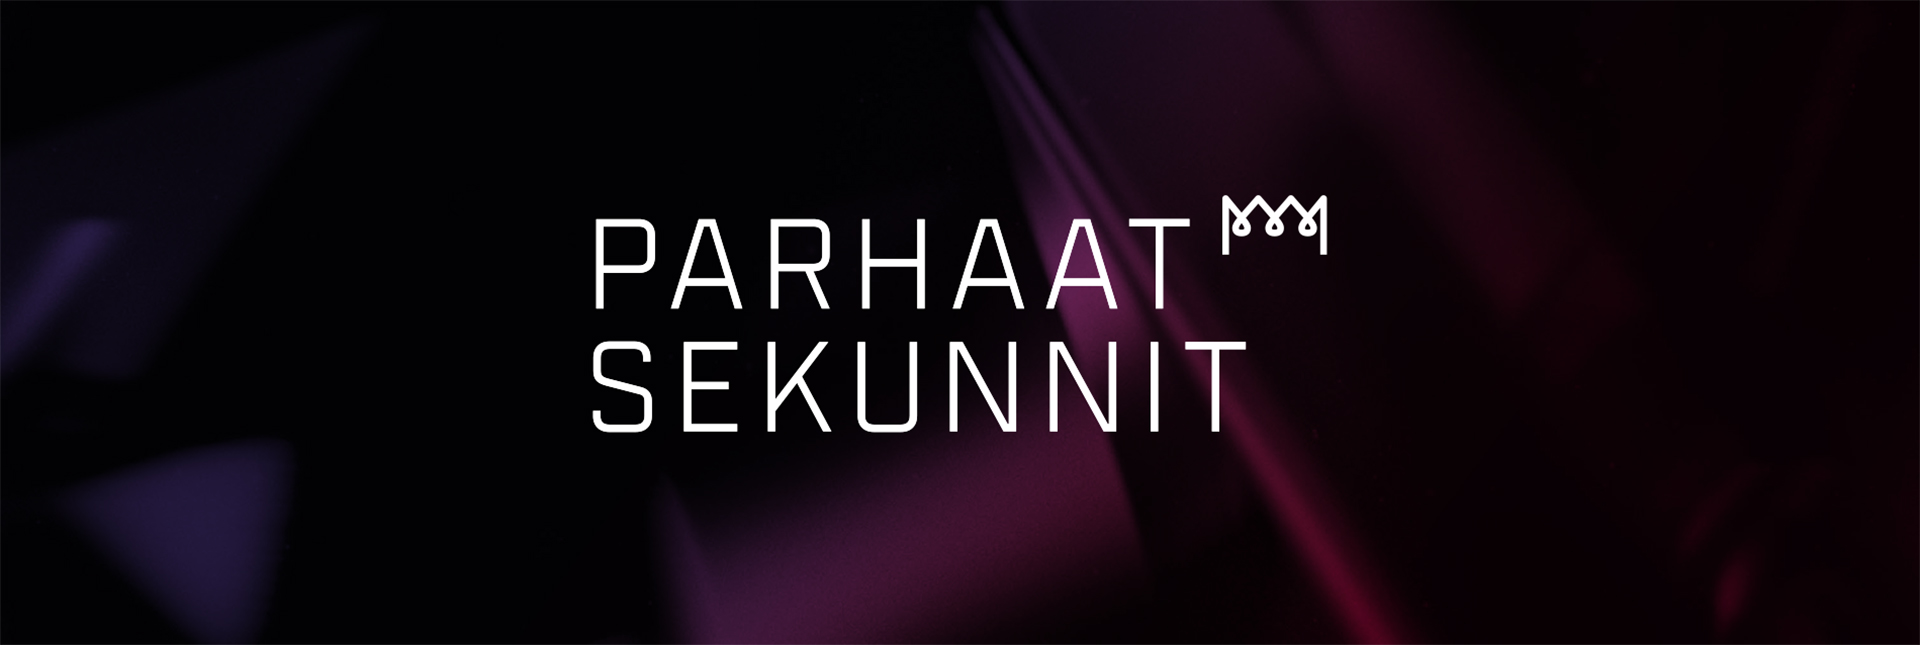 parhaat-sekunnit-1920px